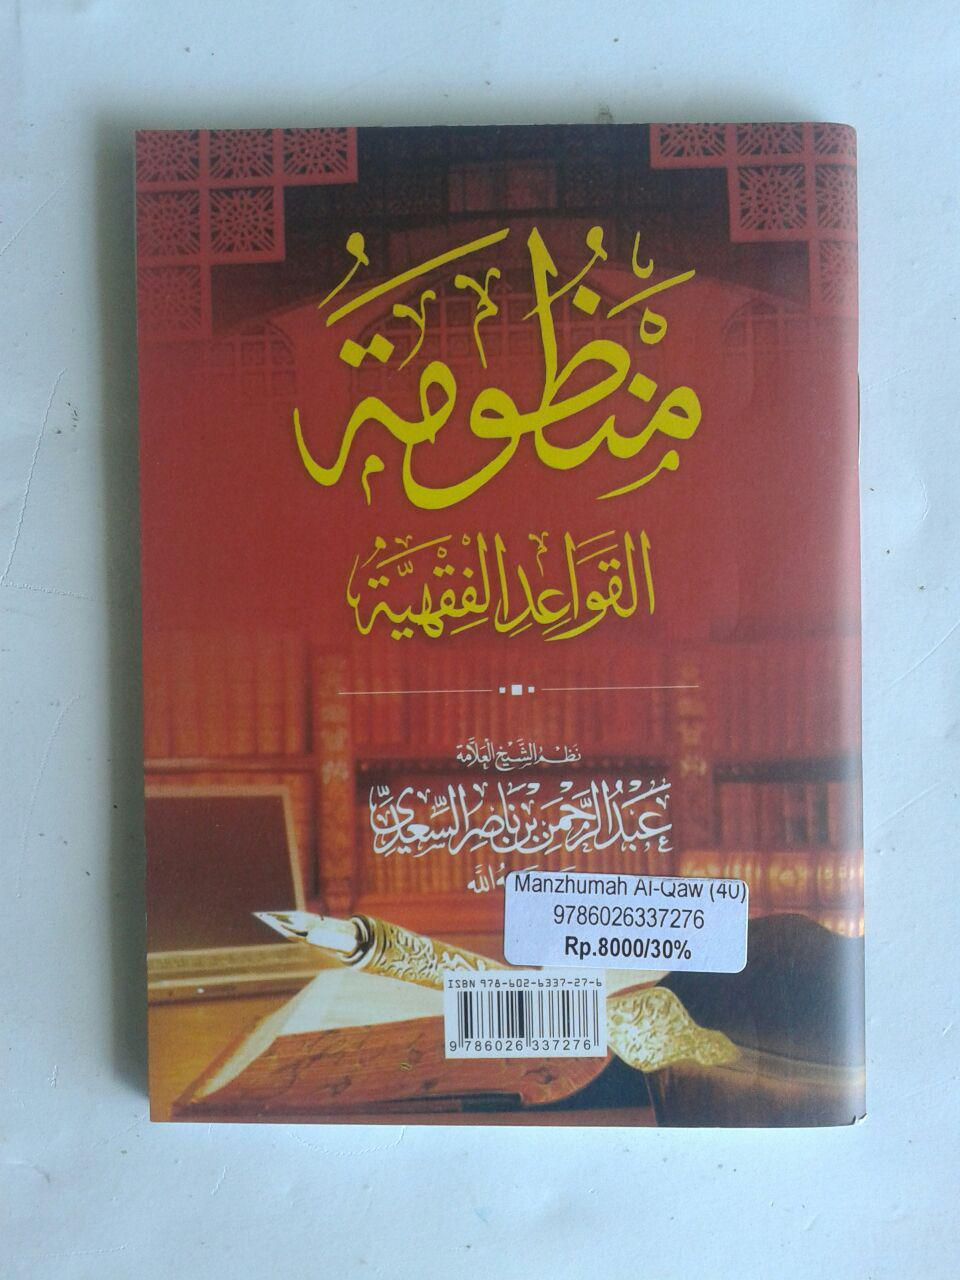 Buku Saku Manzhumah Al-Qawaid Al-Fiqhiyyah As-Sa'diy cover